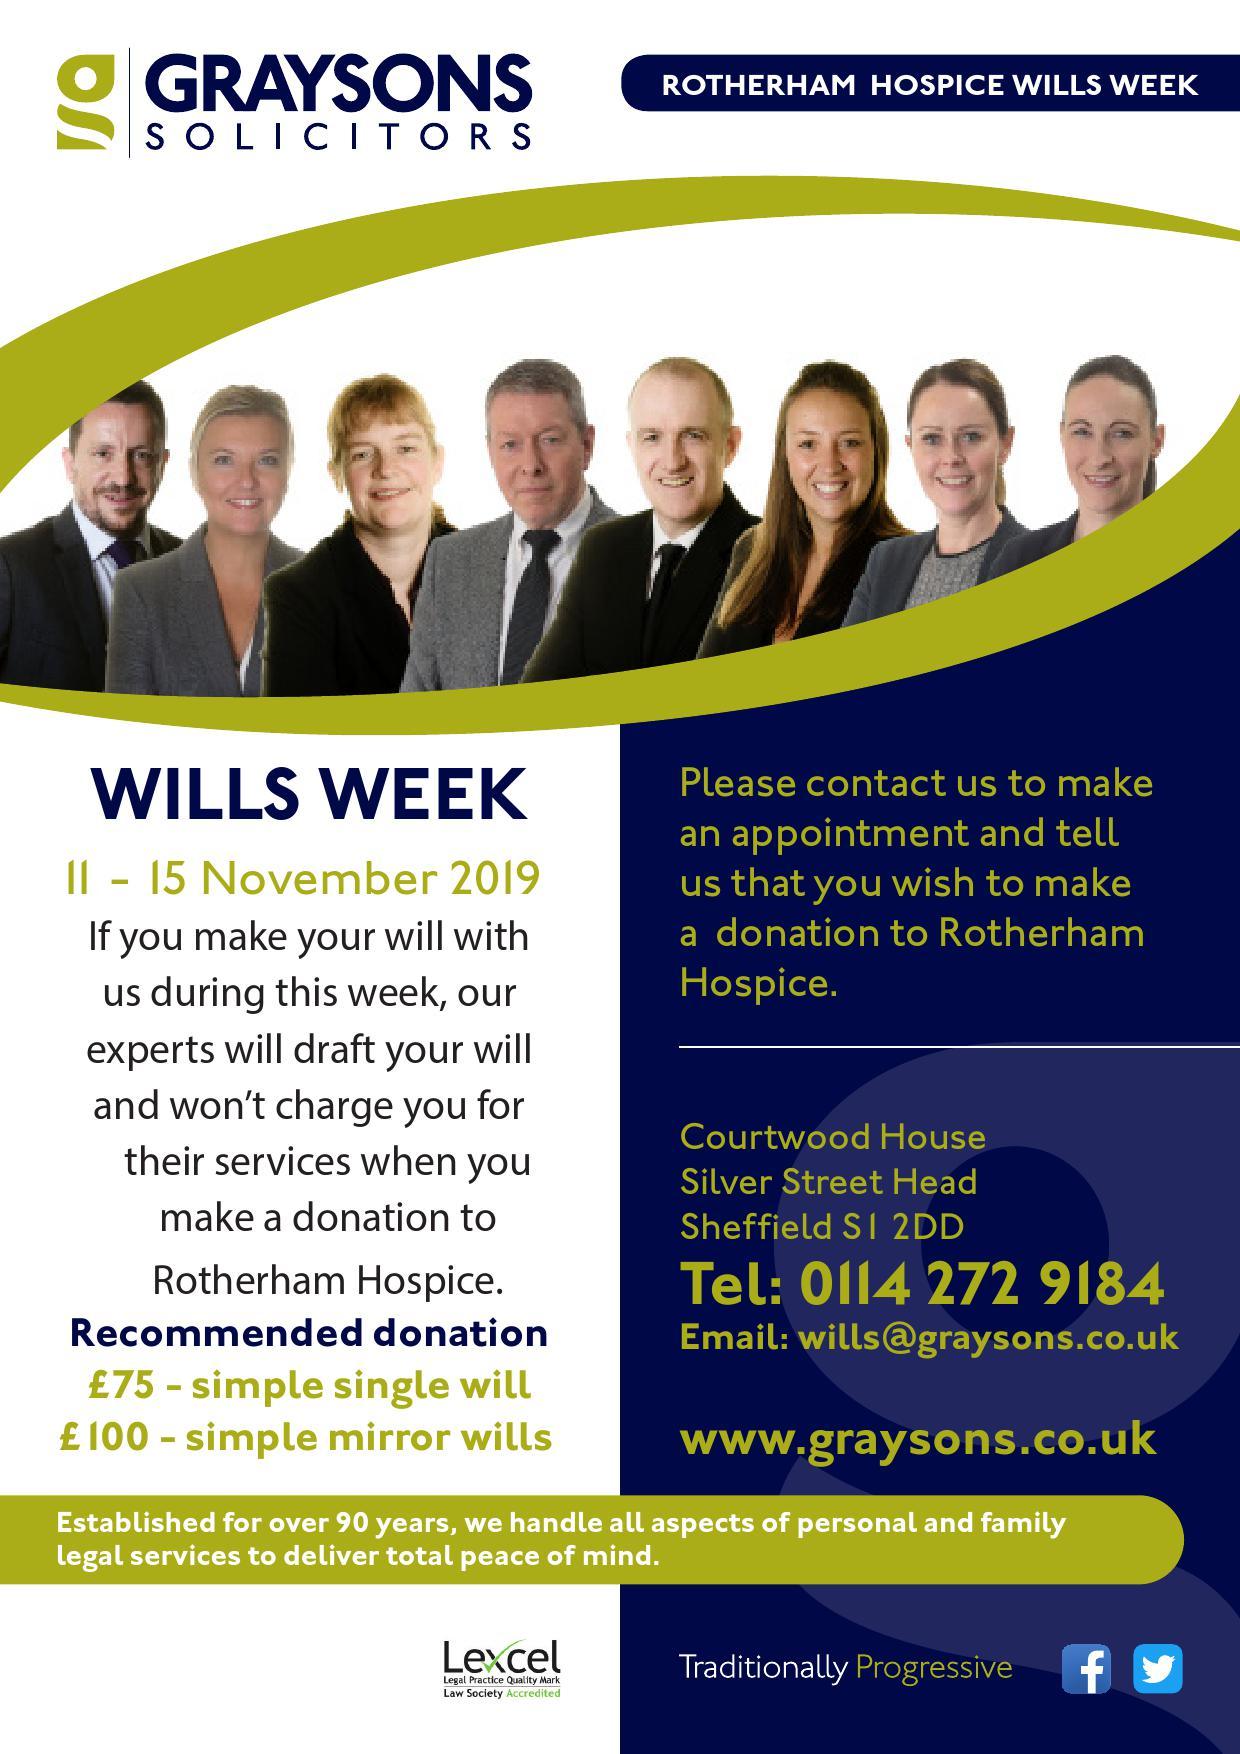 Rotherham Hospice wills week